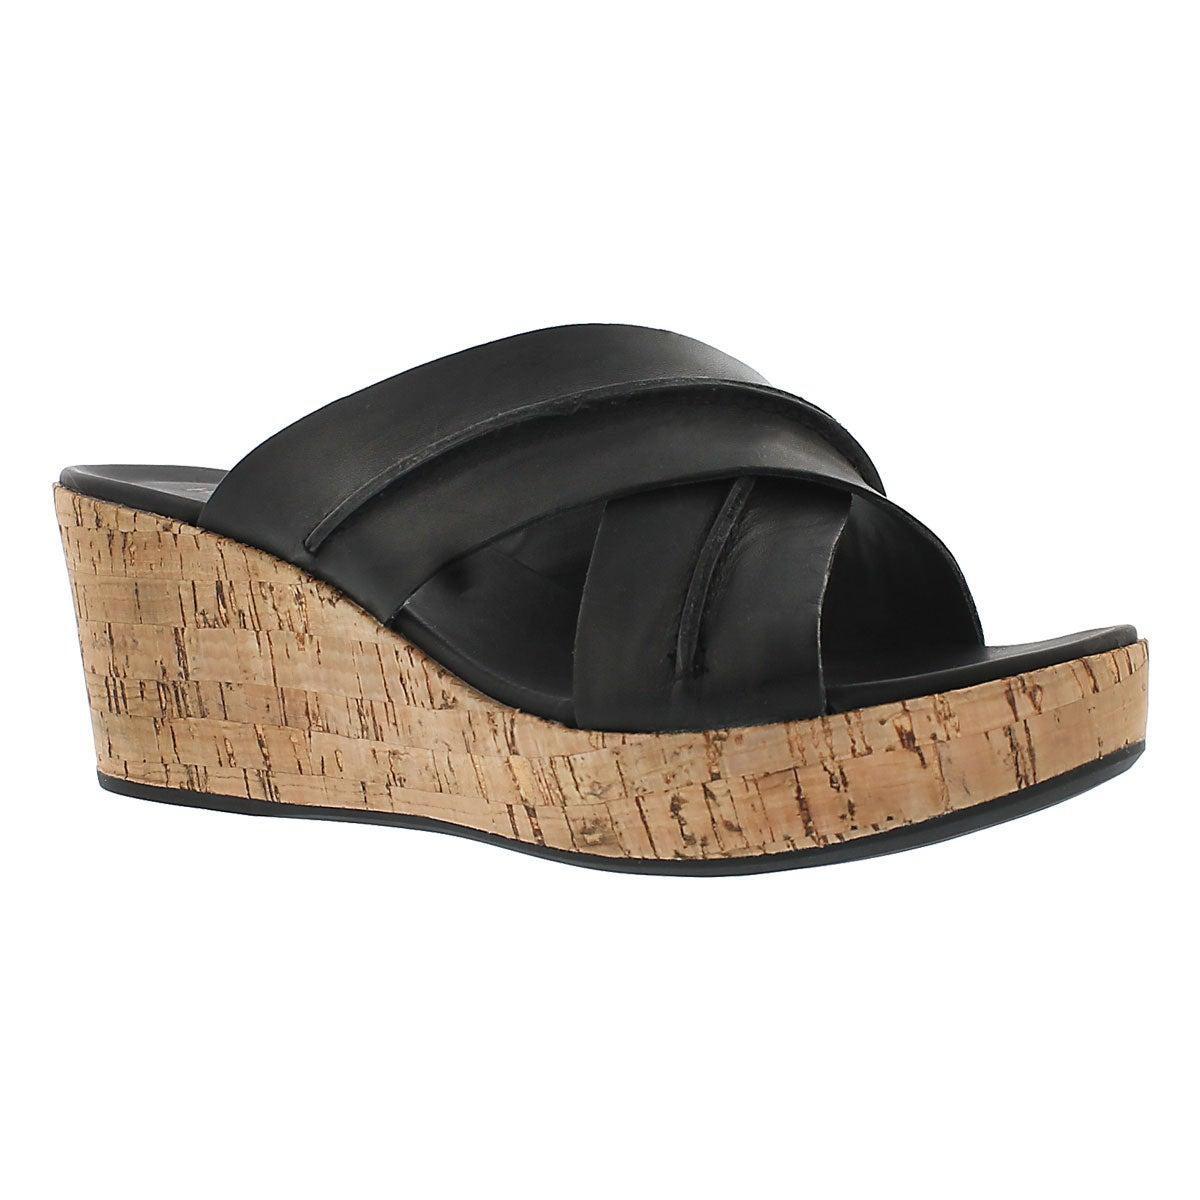 Women's BELINDA DURANTE black wedge sandals